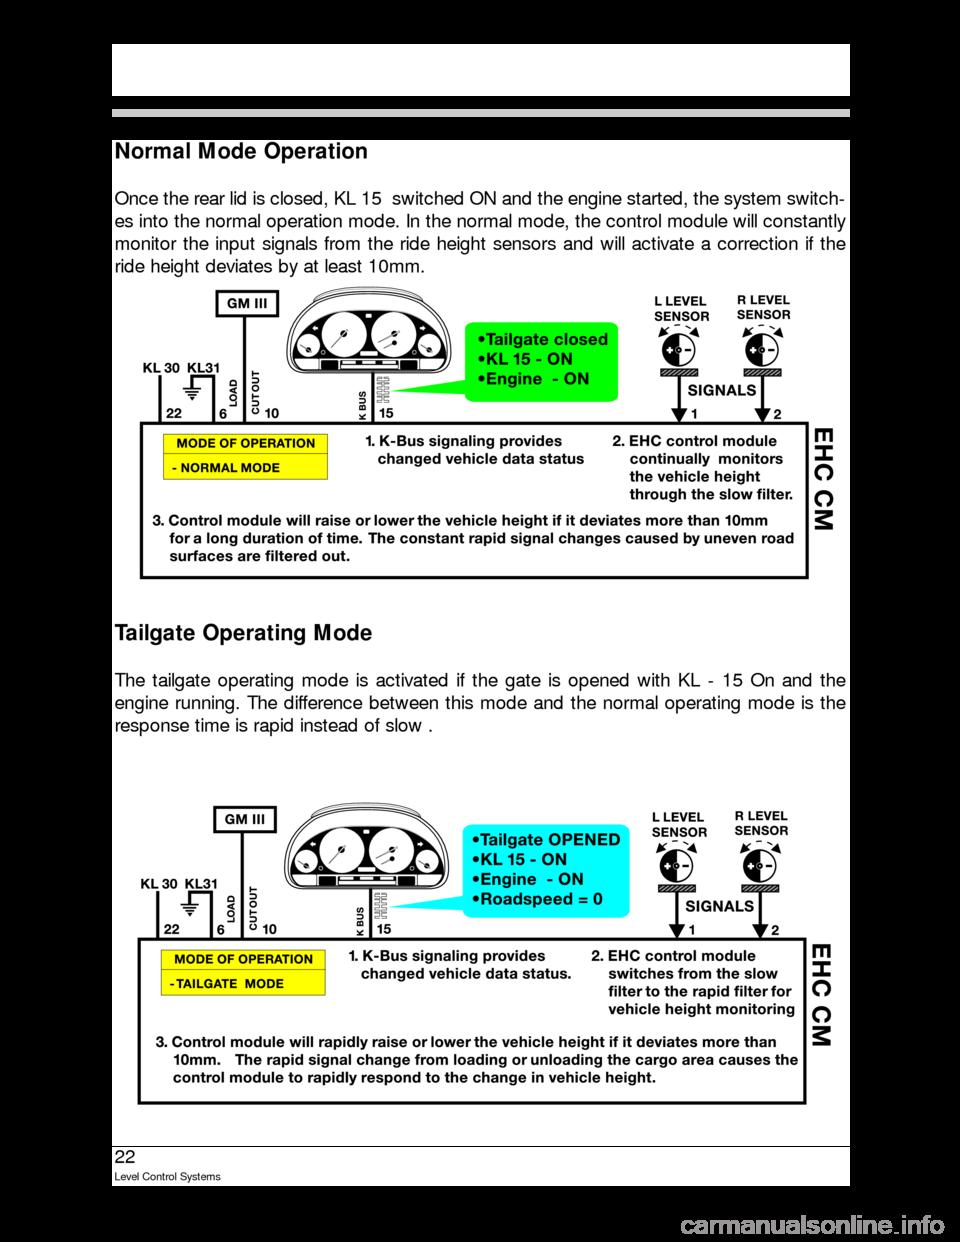 jba system 21 documentation